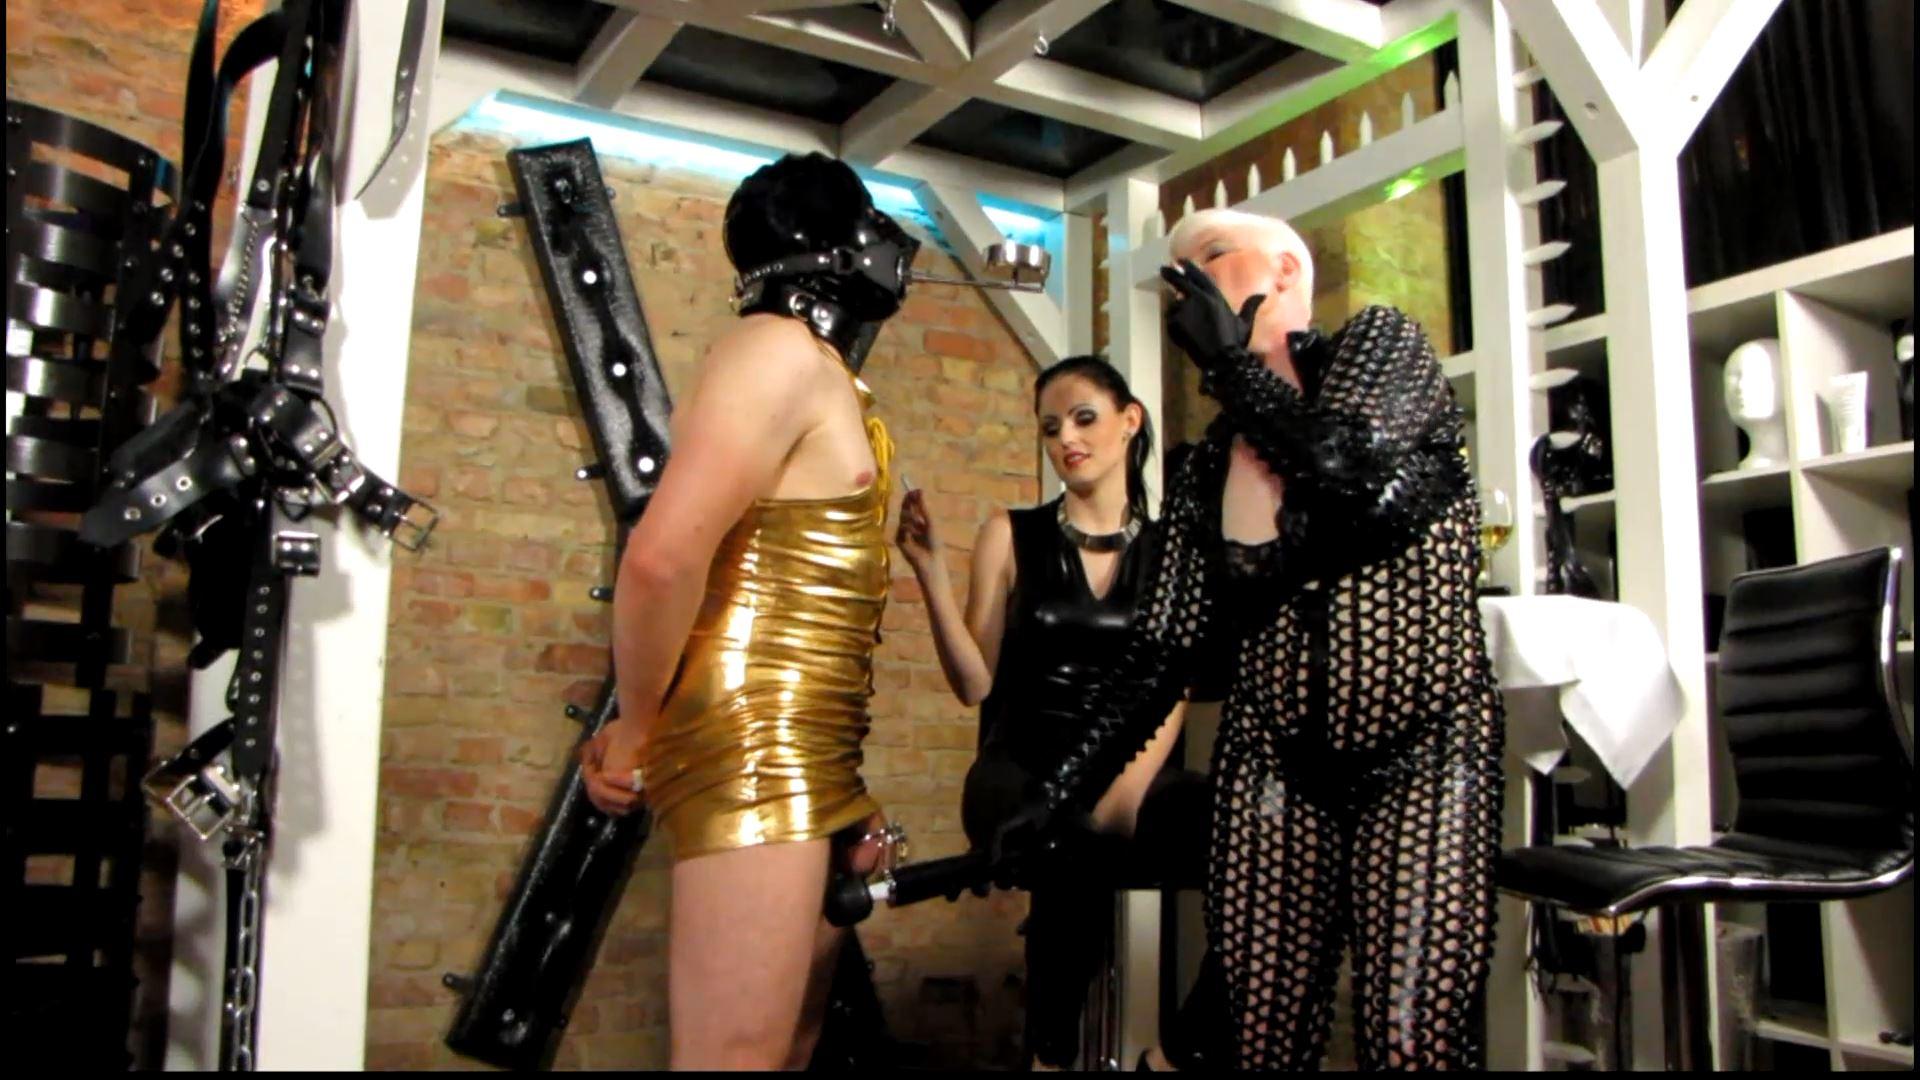 Mistress Blackdiamoond In Scene: Chastity Put To The Test - CLIPS4SALE / MISTRESS BLACKDIAMOOND - FULL HD/1080p/MP4